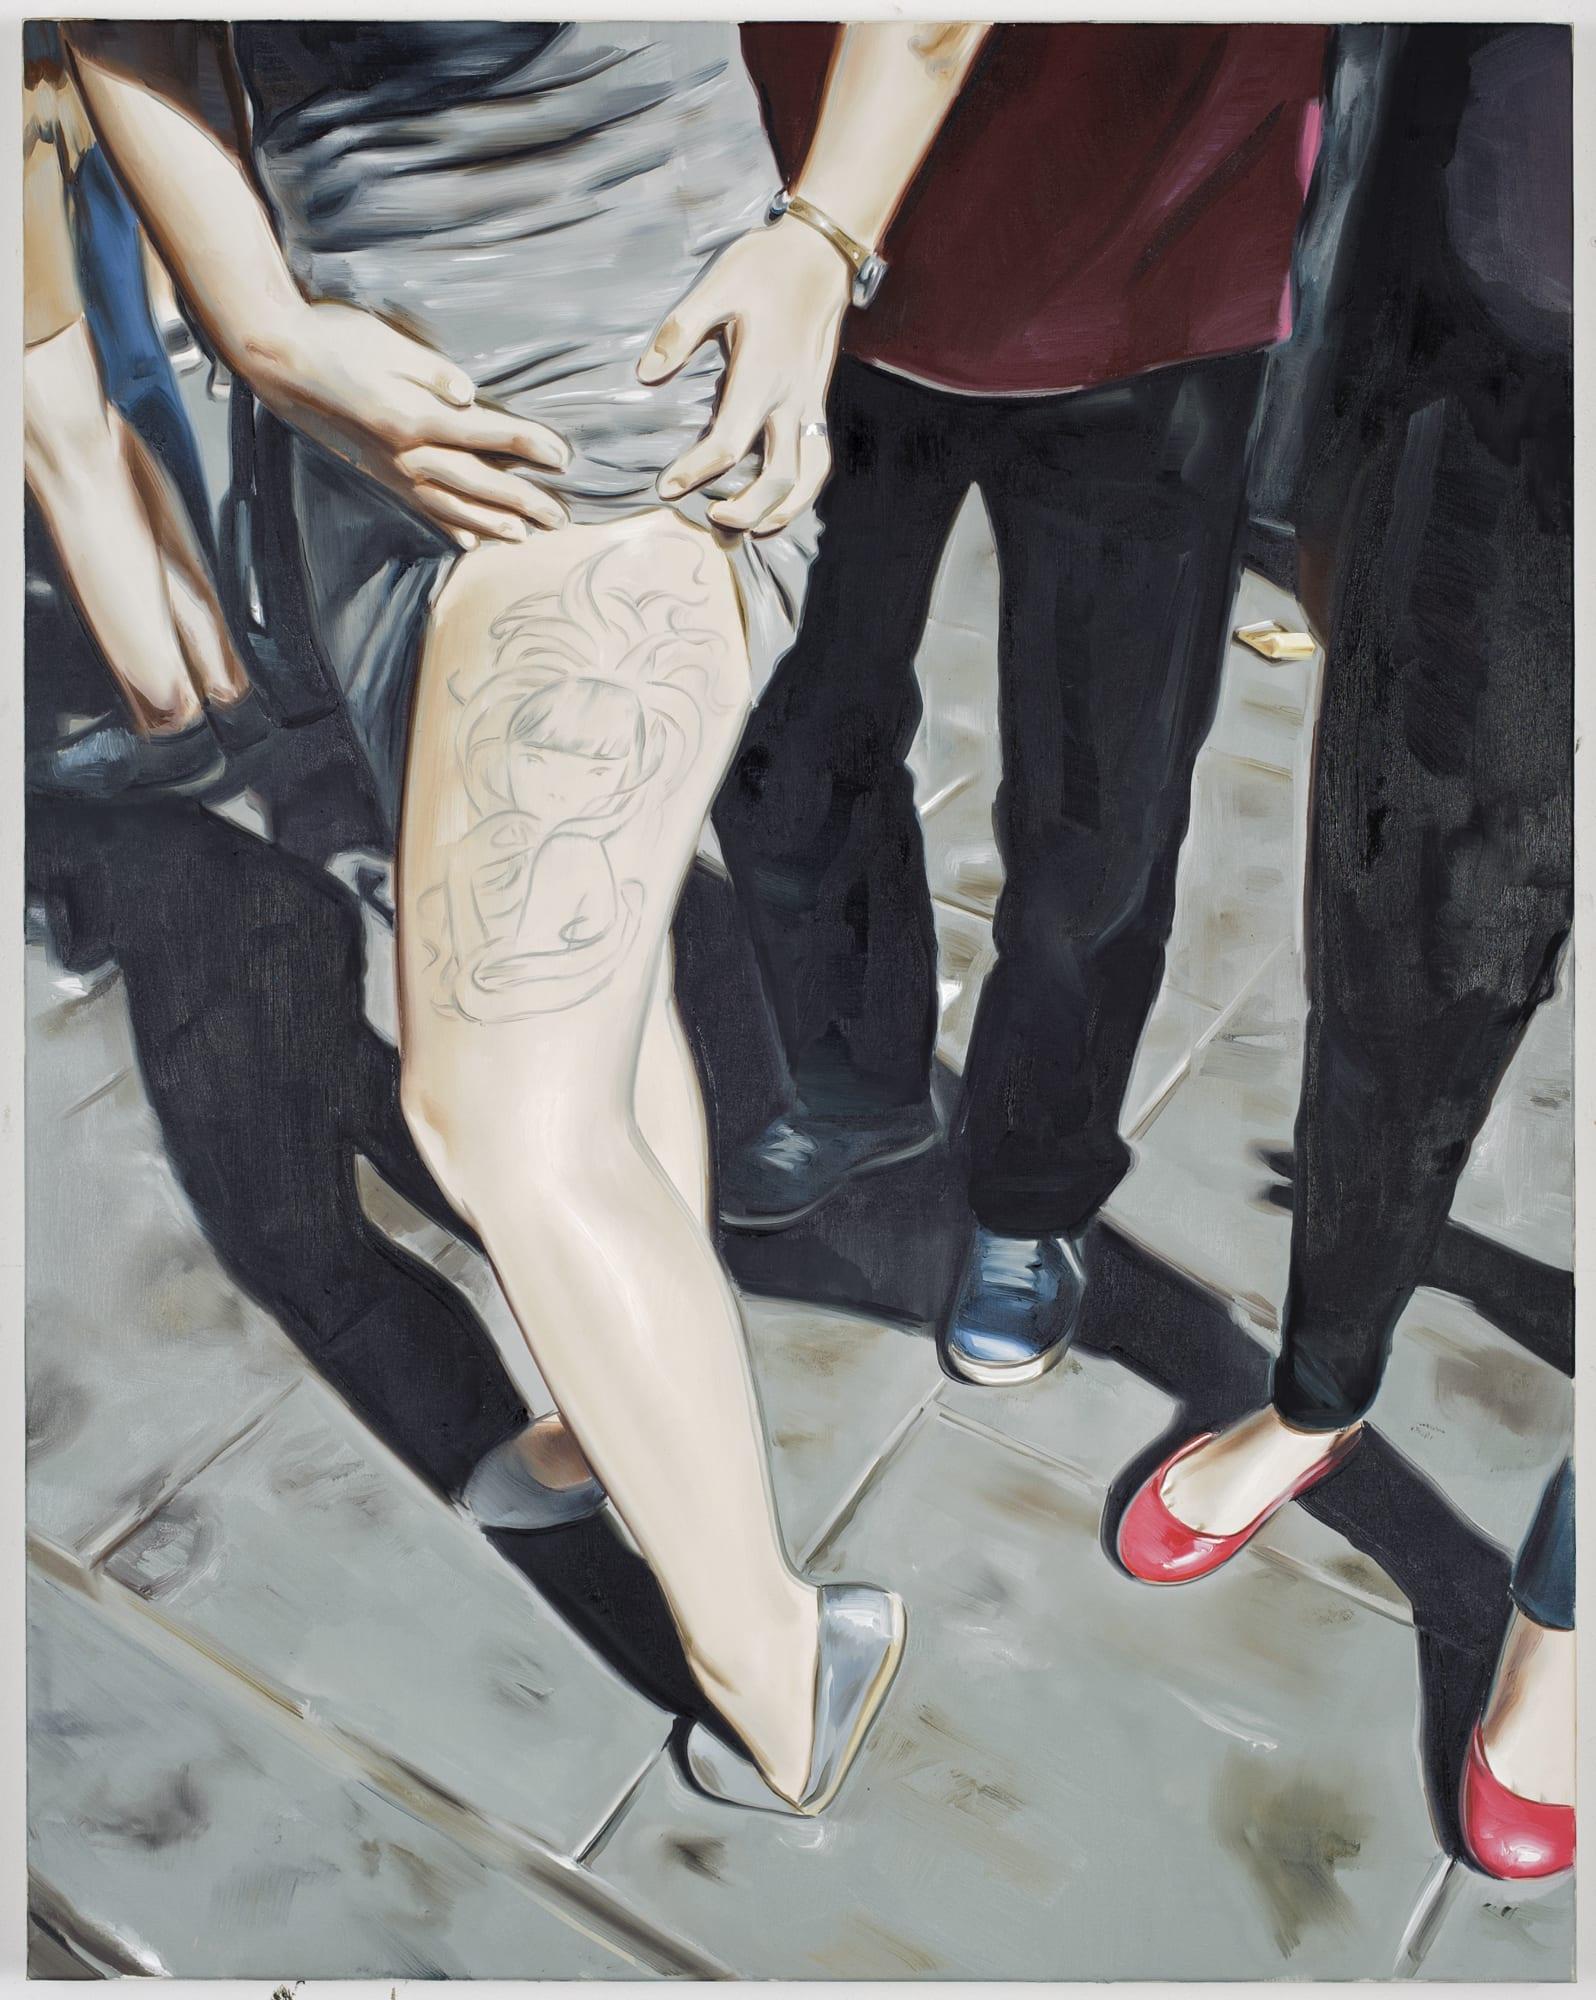 Marcin Maciejowski, Tattoo (Audrey Kawasaki) (2019); Private View at Thaddaeus Ropac Ely House 2019